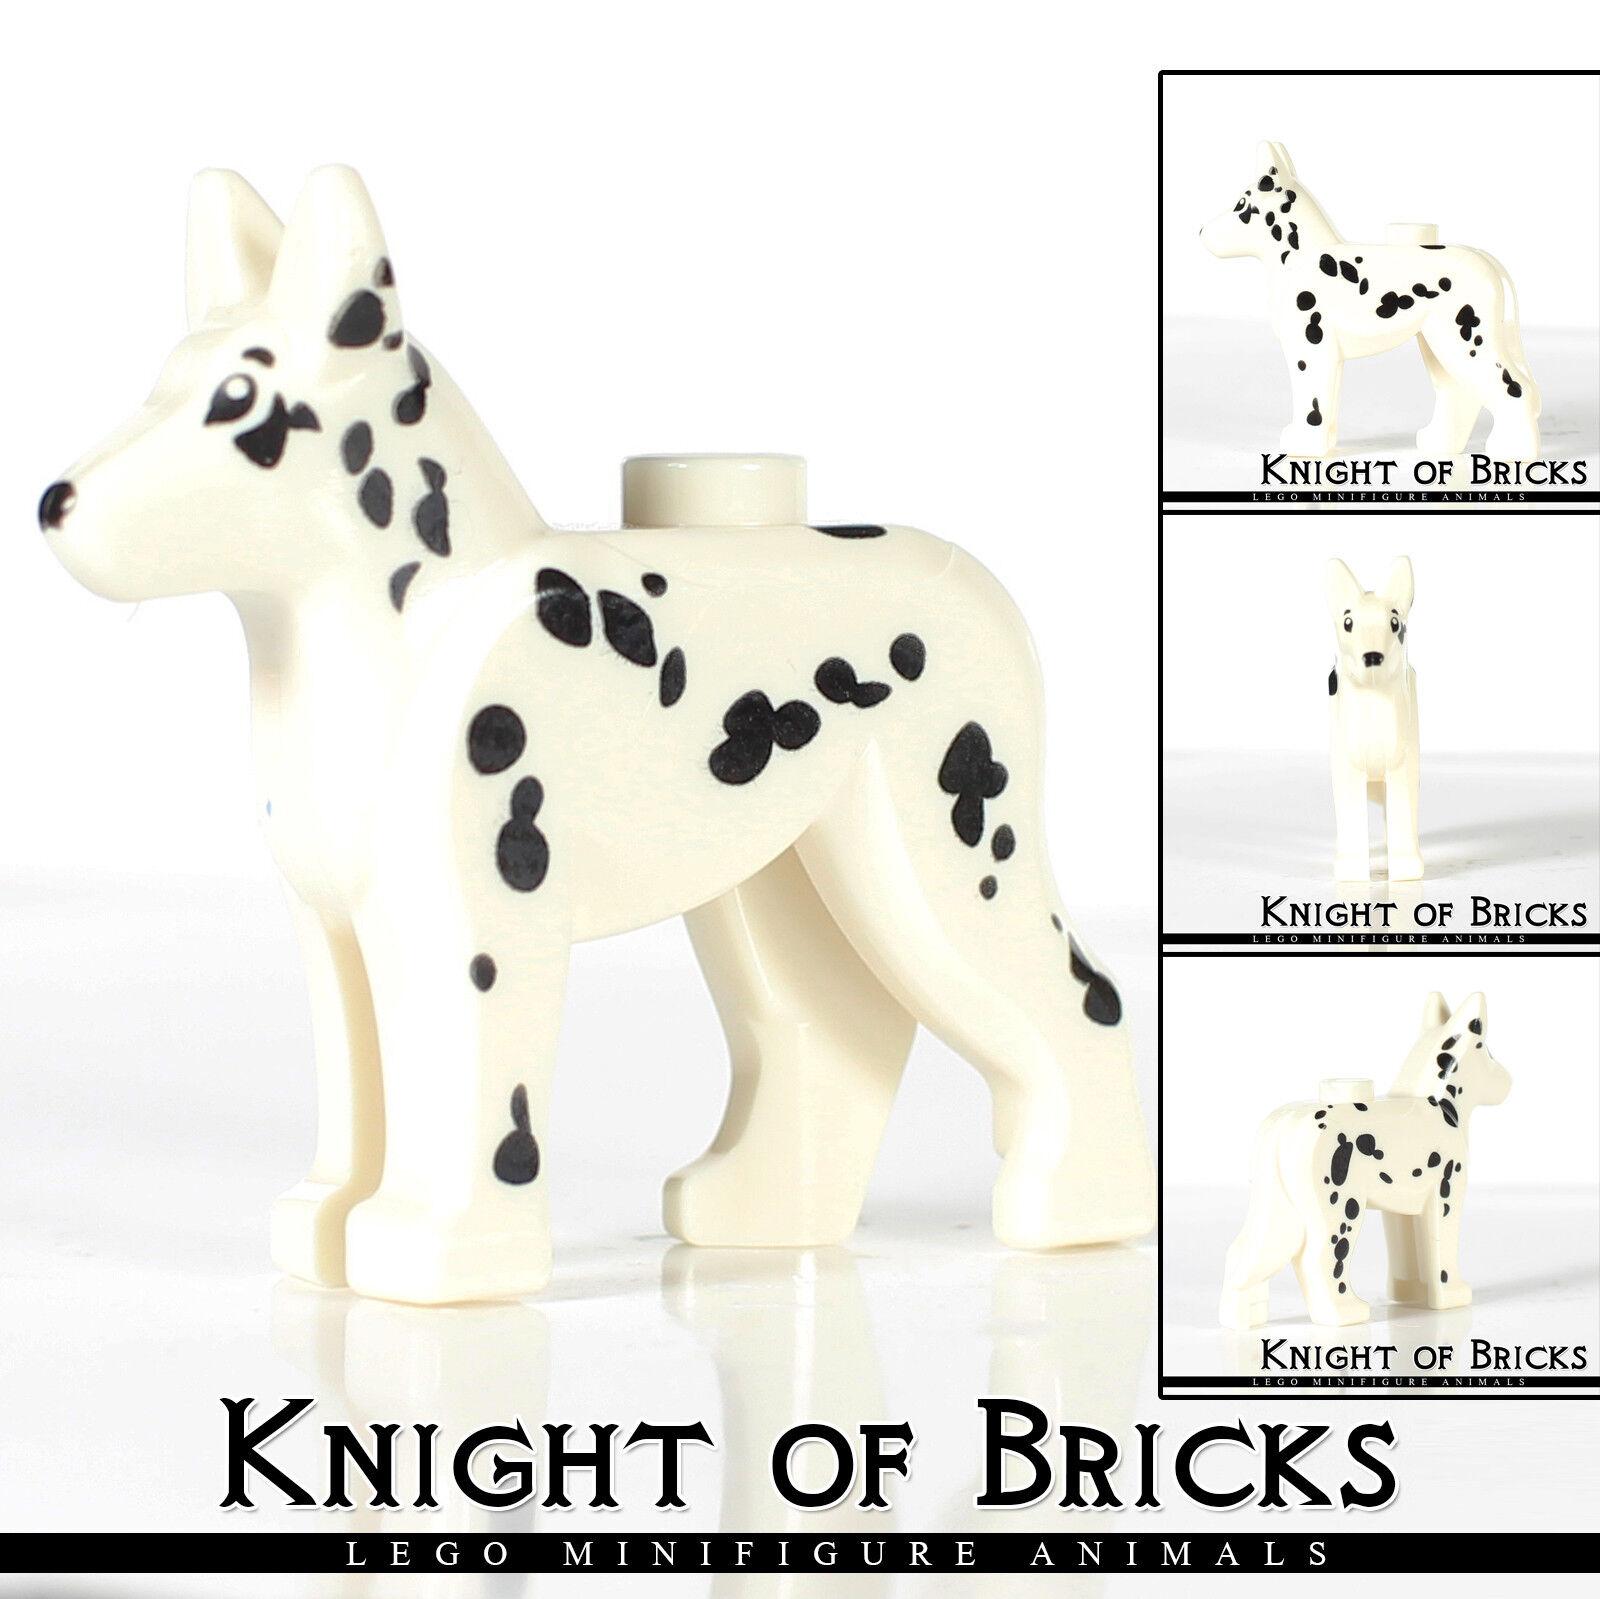 LEGO 7 DOGS Minifigure Animal Husky Shepherd Dalmatian Chihuahua Poodle Terrier